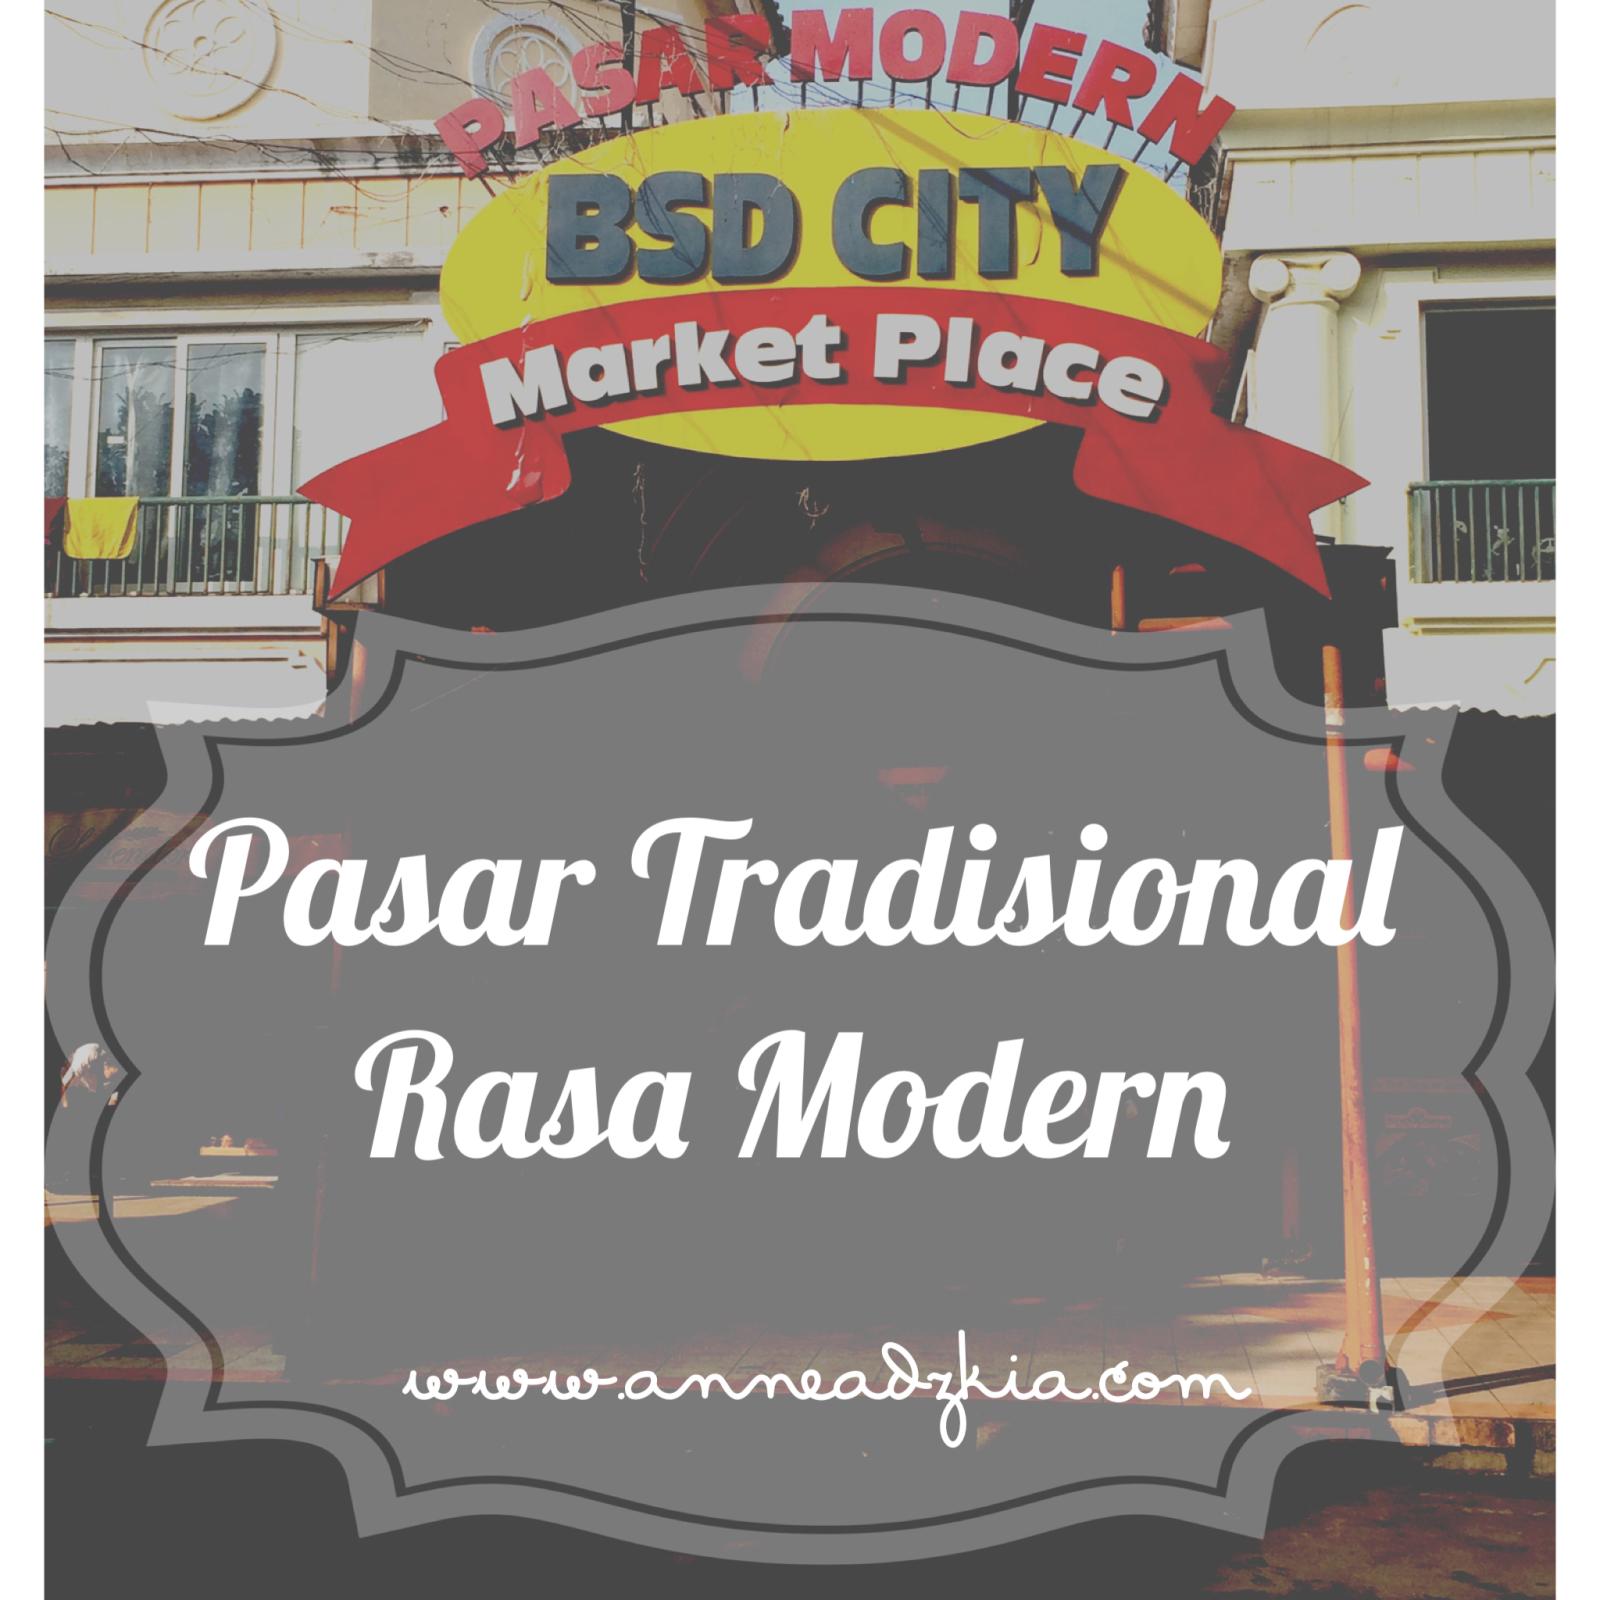 Pasar Tradisional Rasa Modern: Pasar Modern BSD